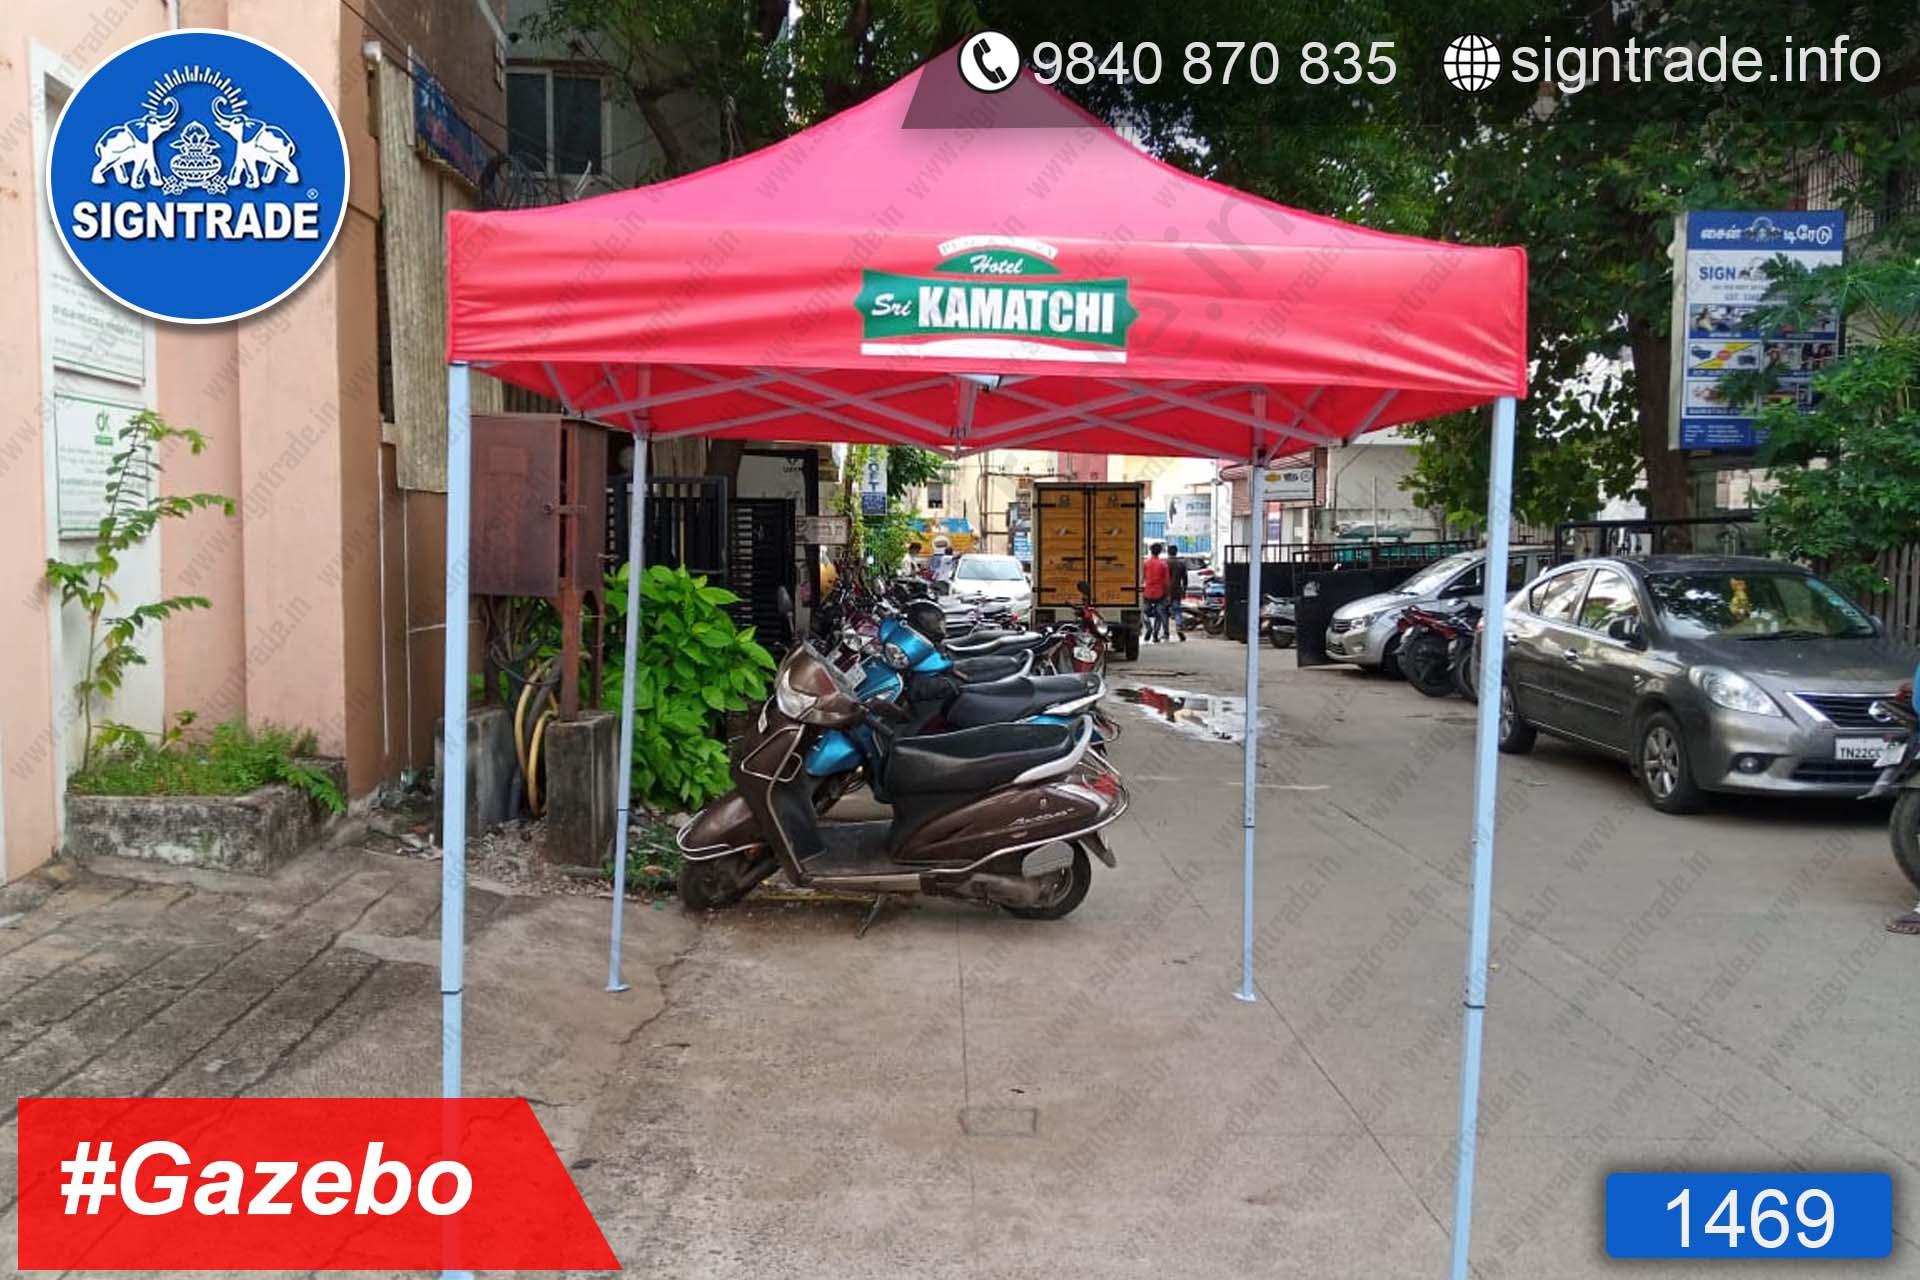 KAMATCHI - Chennai - SIGNTRADE - Gazebo Tent Manufacture in Chennai